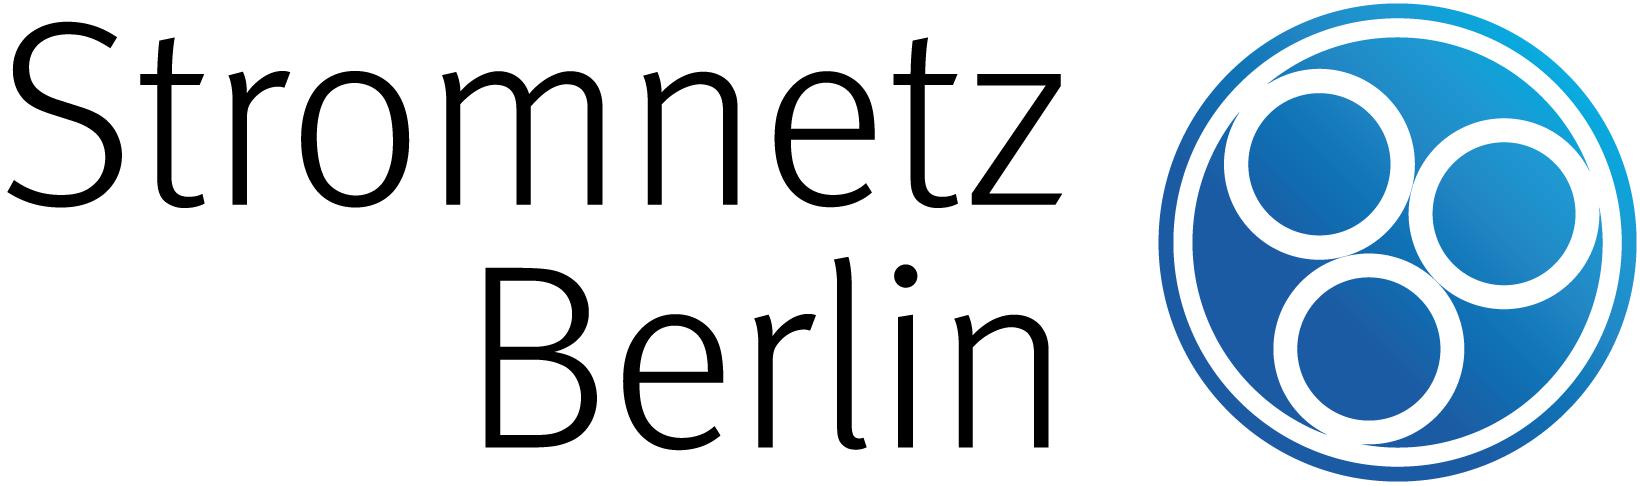 Partner Logo Stromnetz Berlin GmbH